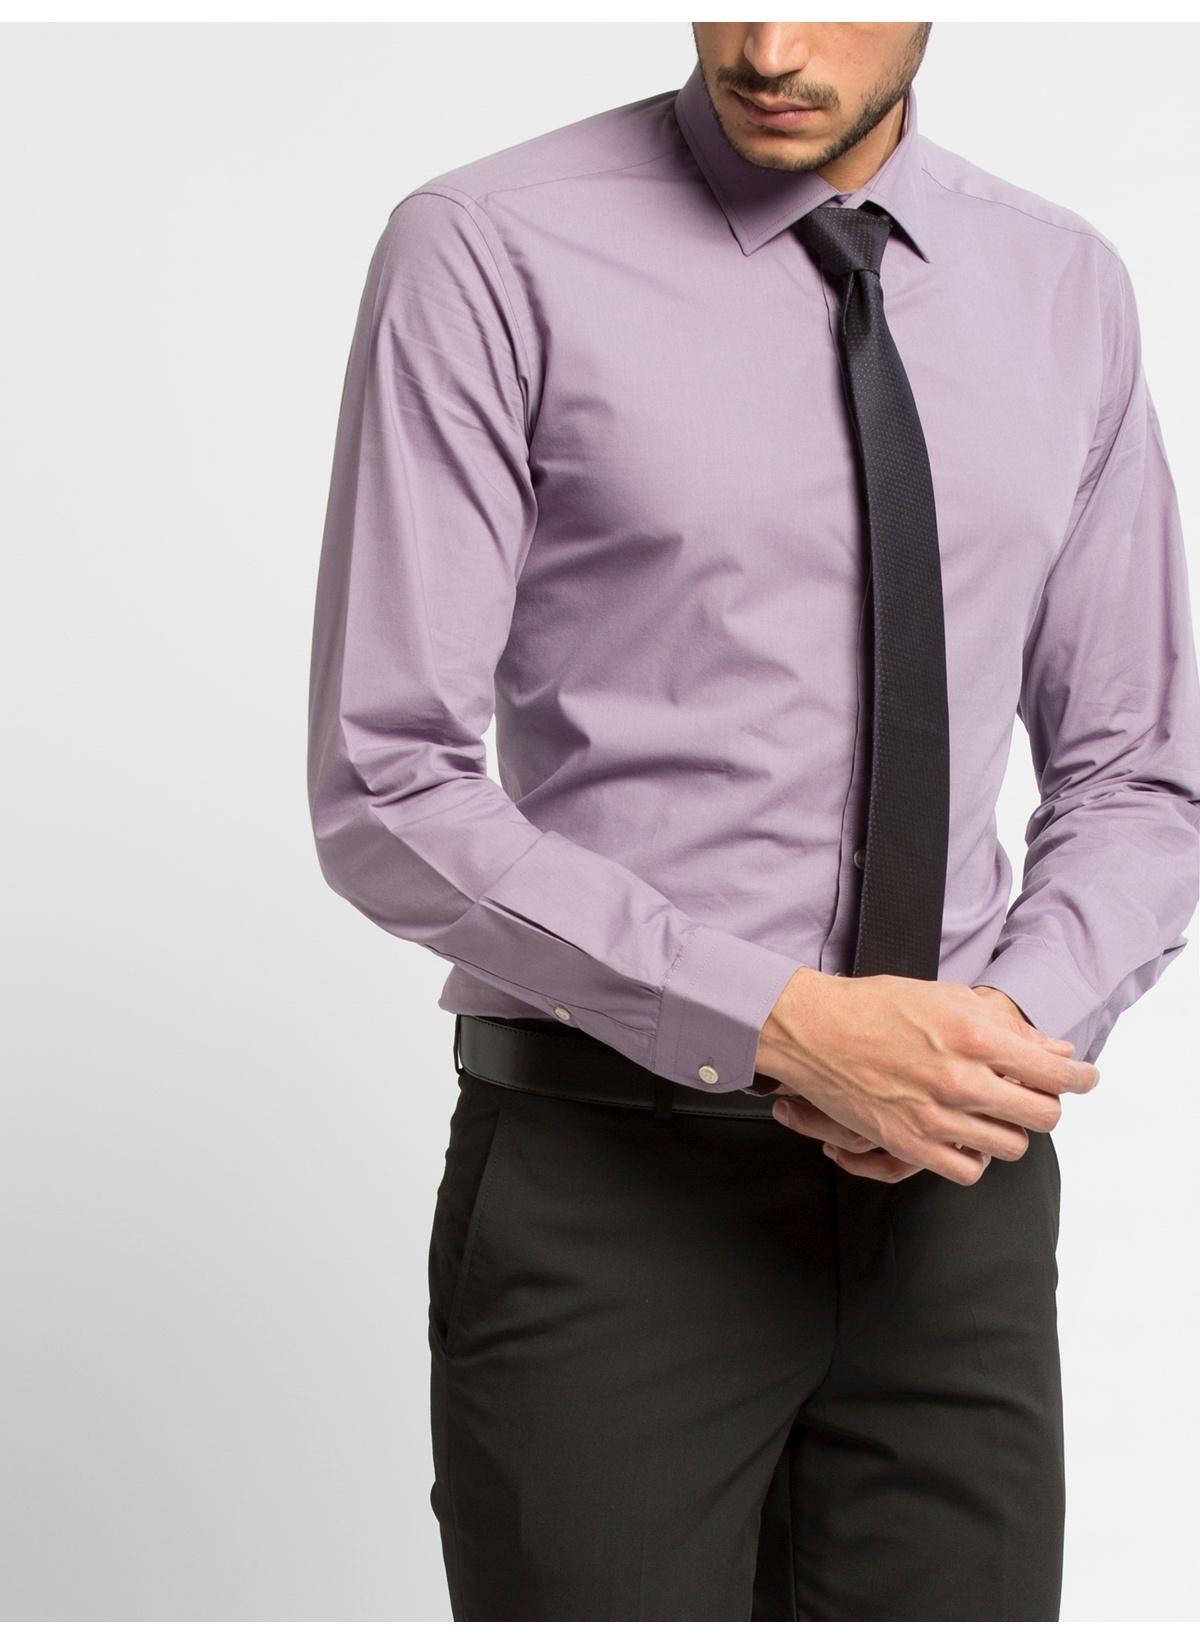 Lc Waikiki Uzun Kollu Slim Fit Gömlek 6k2781z8 Gömlek – 25.99 TL